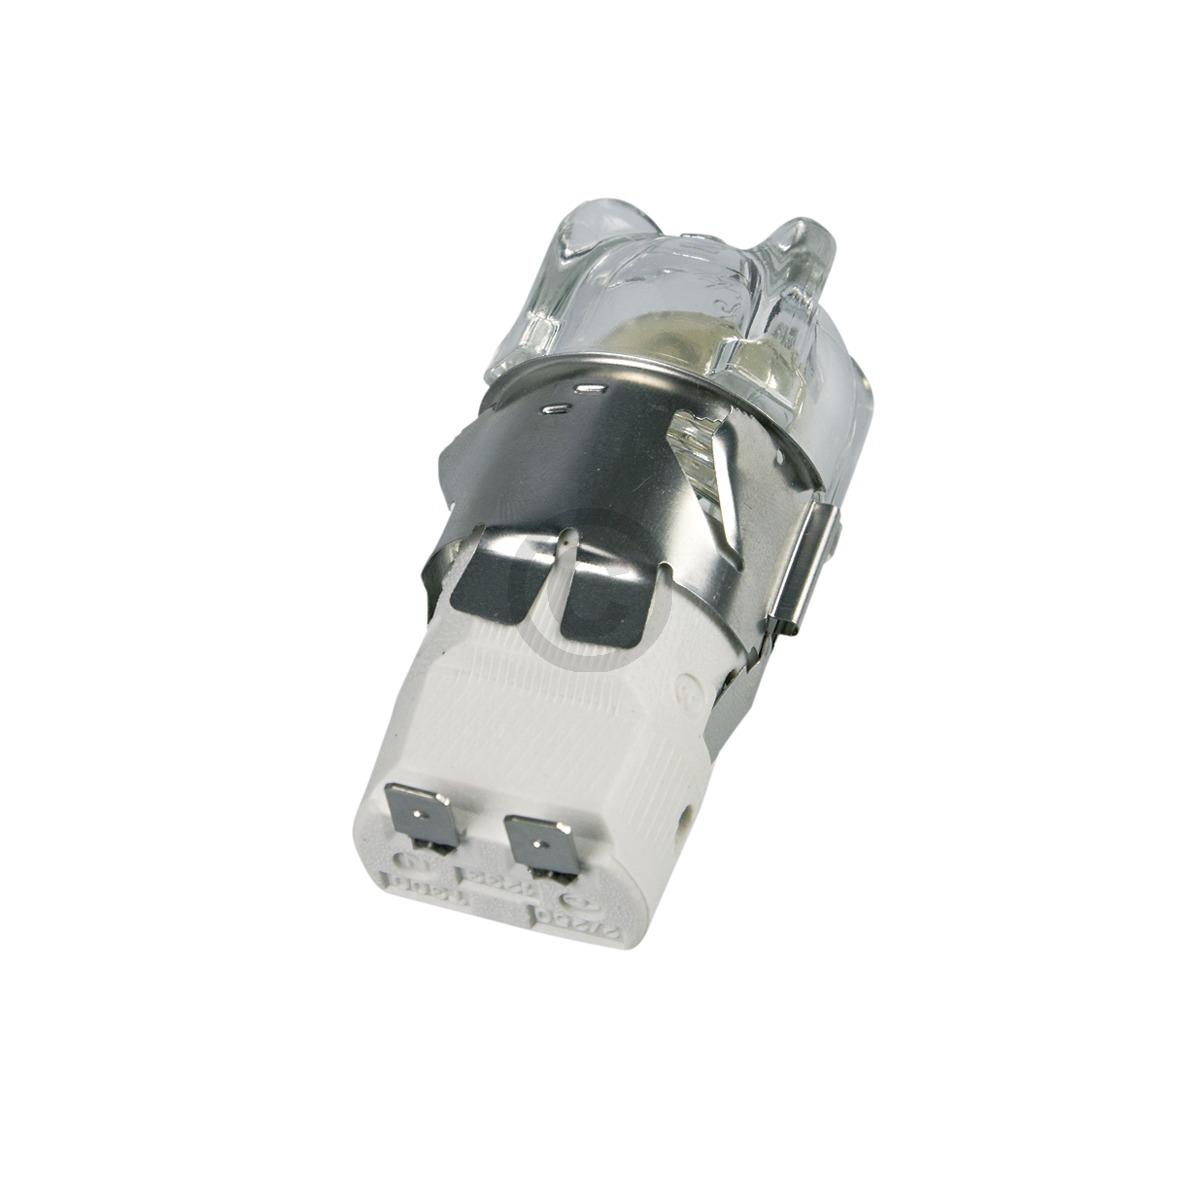 Lampeneinheit komplett 00650242 650242 Bosch, Siemens, Neff